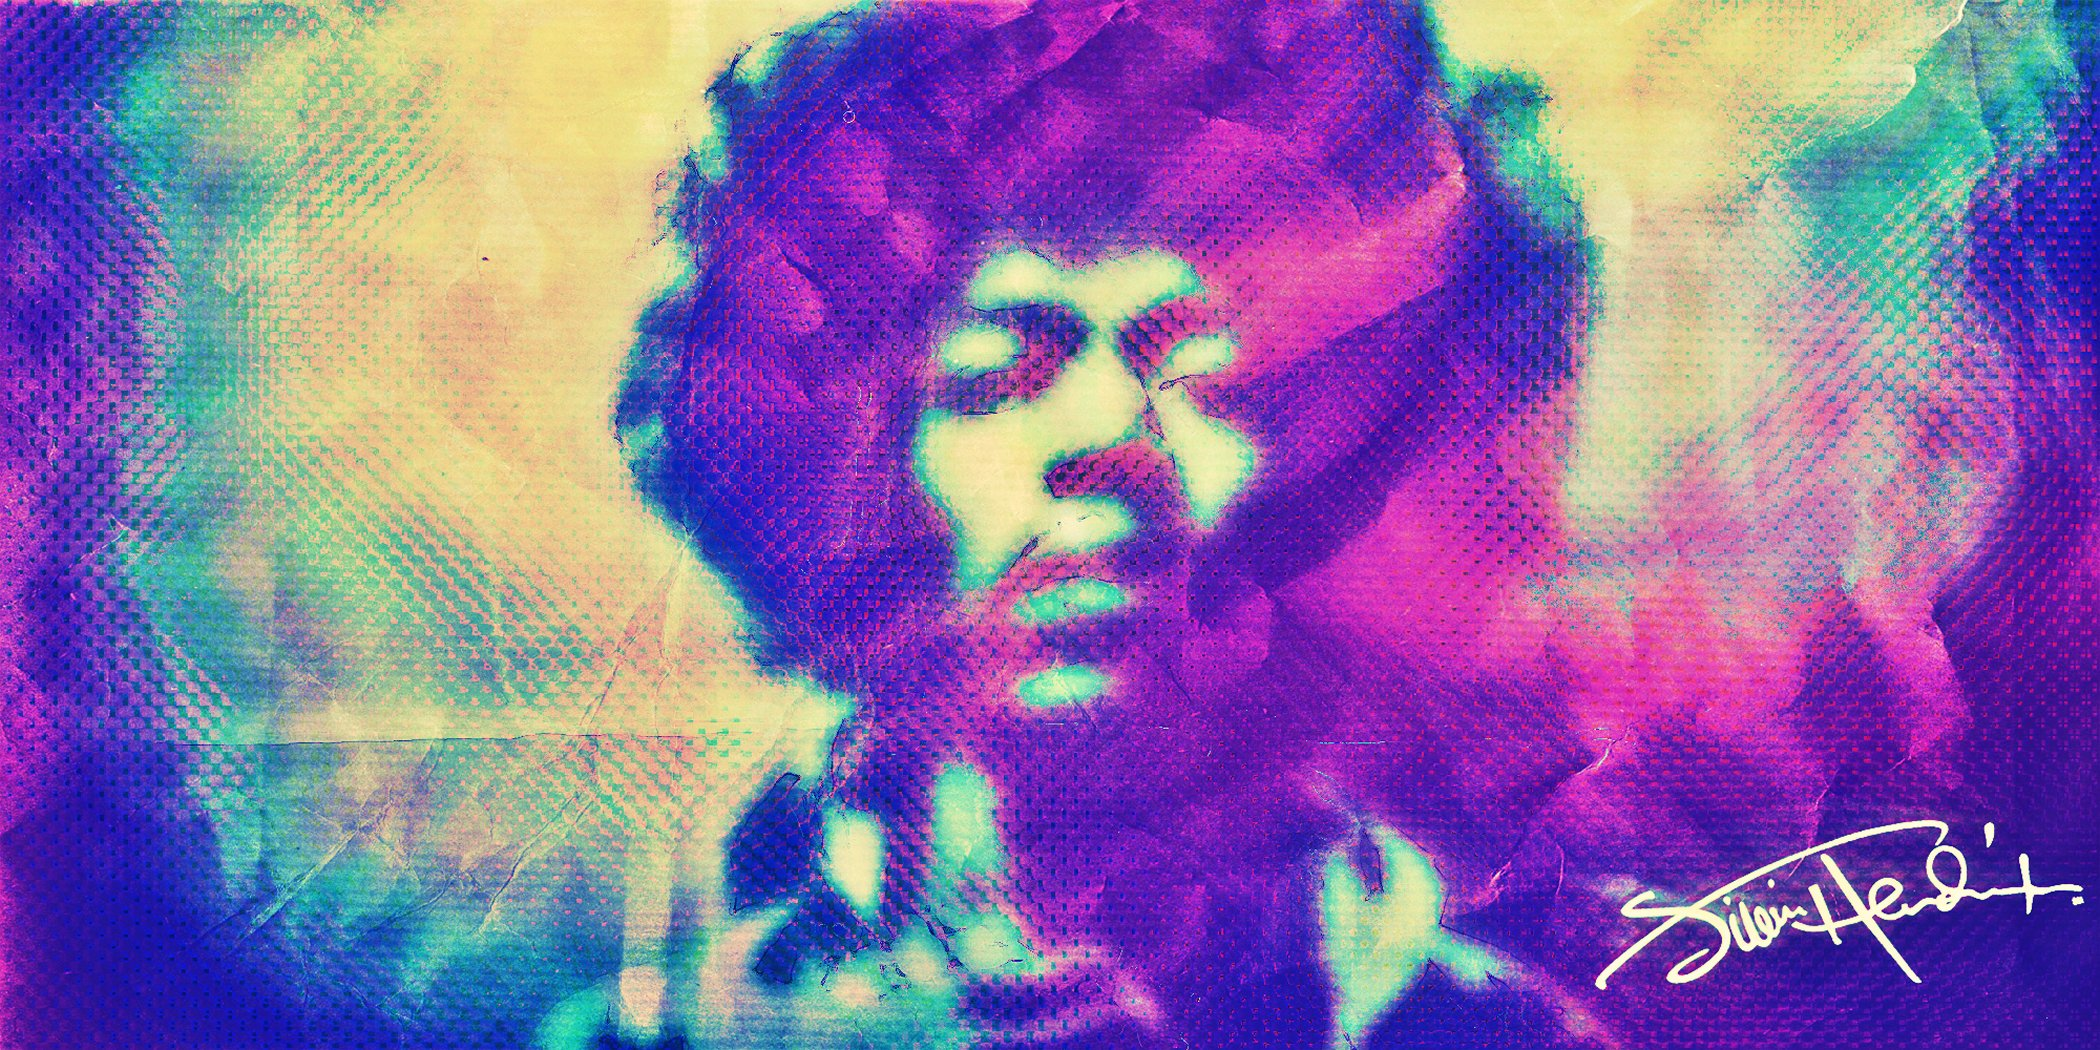 hippie wallpaper widescreen - photo #39